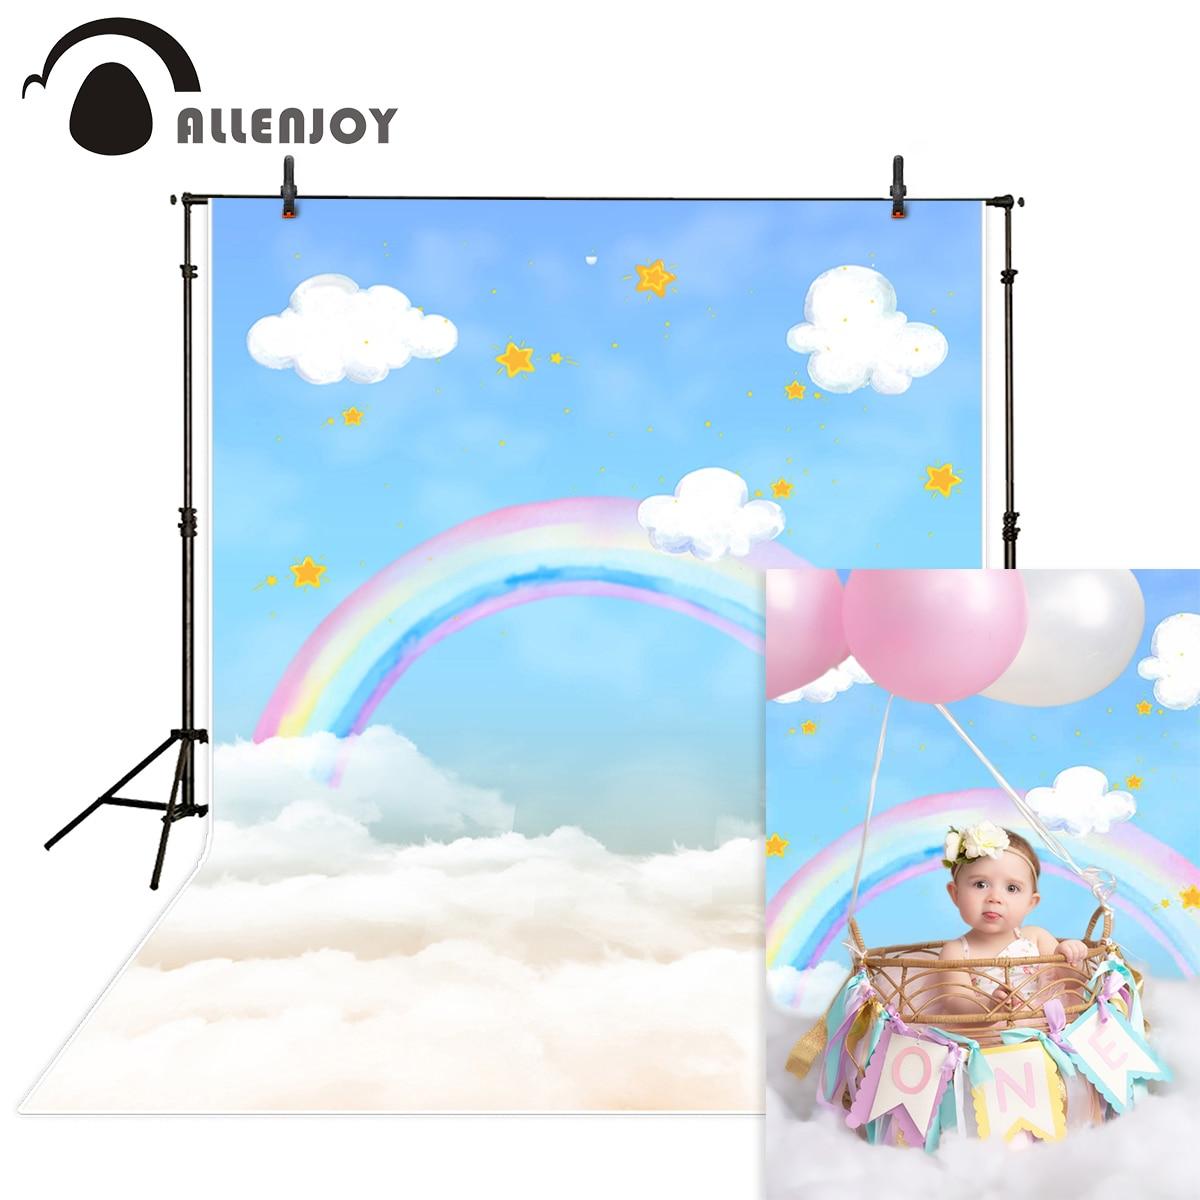 Allenjoy Arco Iris fotografía backdrops nube de dibujos animados cielo azul niño 1er cumpleaños photophone foto de fondo photocall estudio